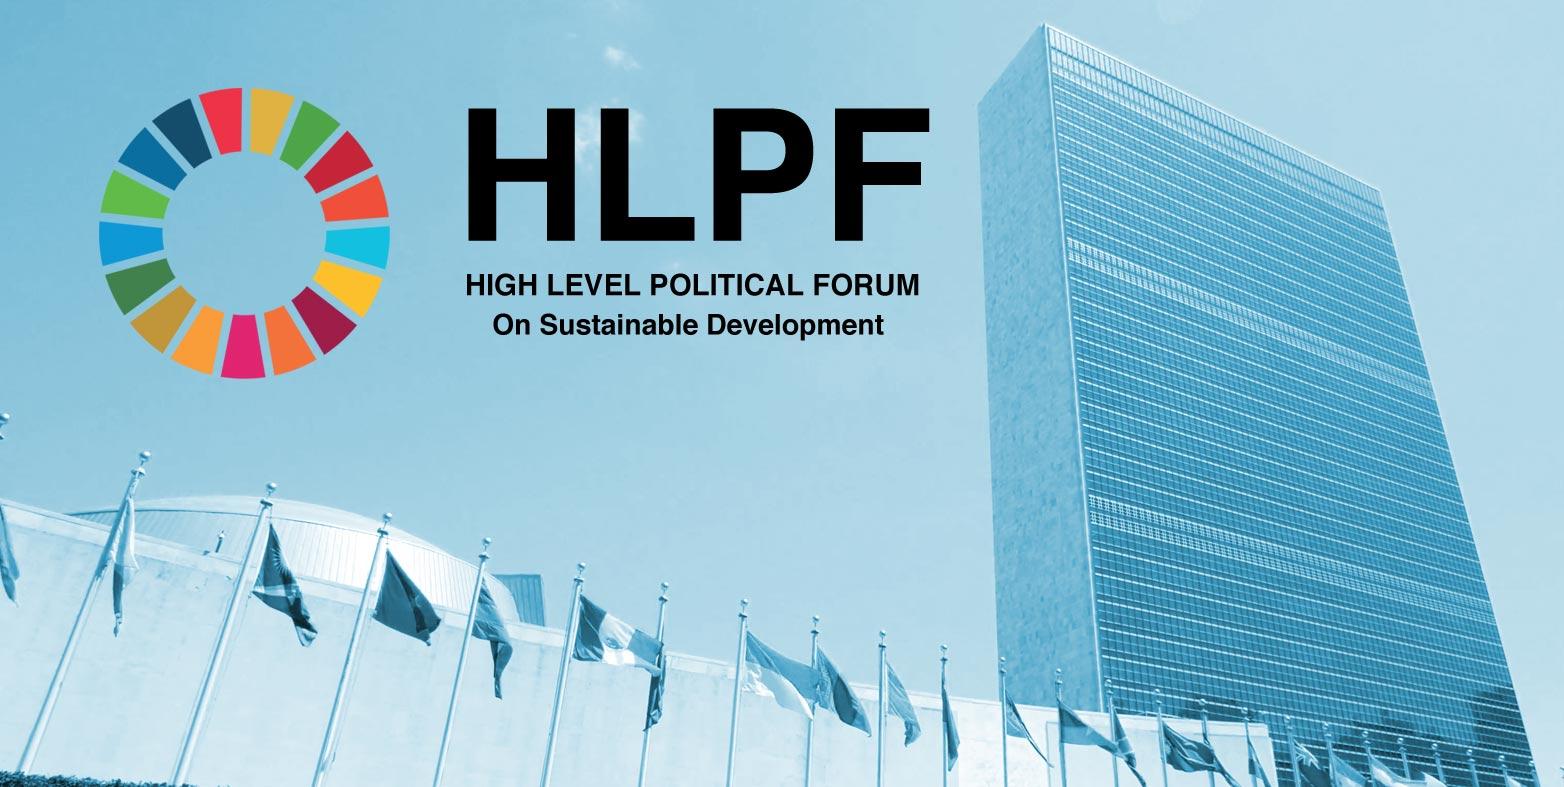 Locating the Agenda 2030: Cybervolunteers at the UN Sustainable Development Forum in New York